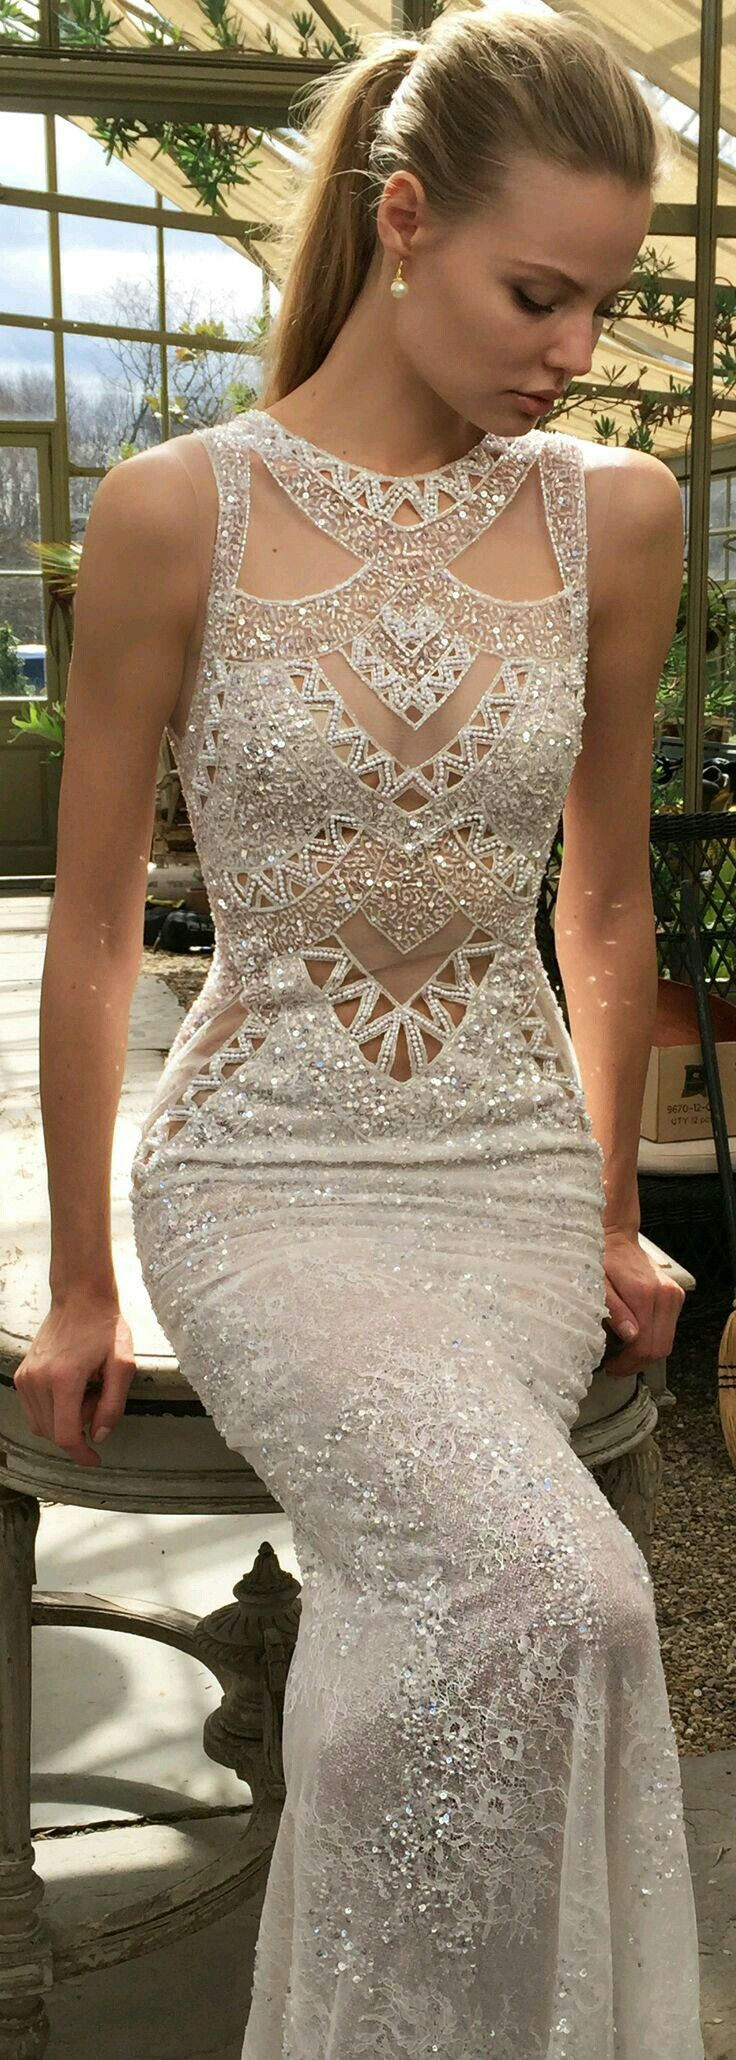 Wedding-Dresses-1026